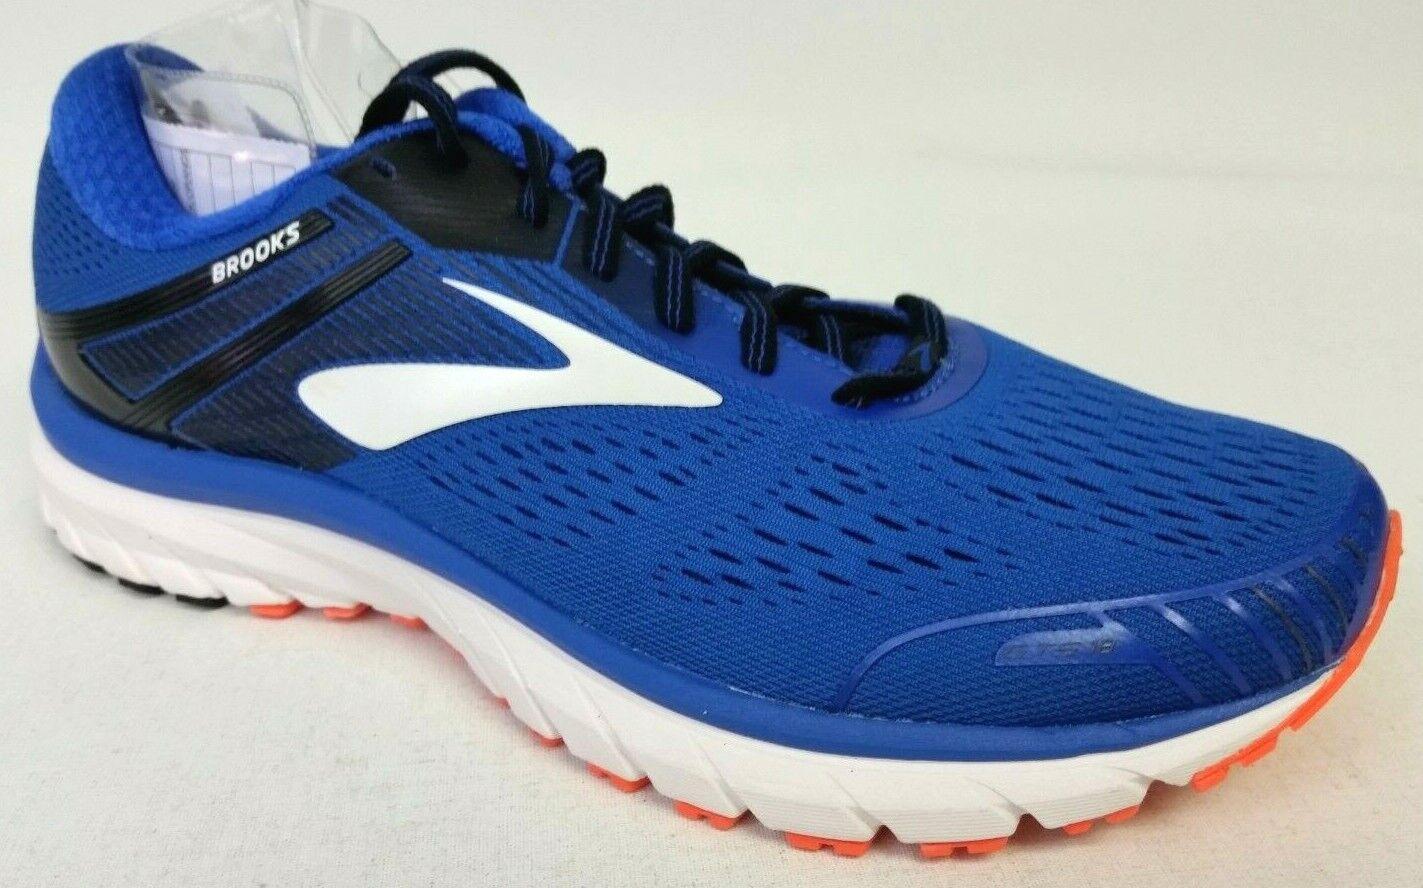 Nuovi uomini Brooks  Adrenaline GTS 18 Scarpe - Dimensione 9 - blu  arancia  basta comprarlo